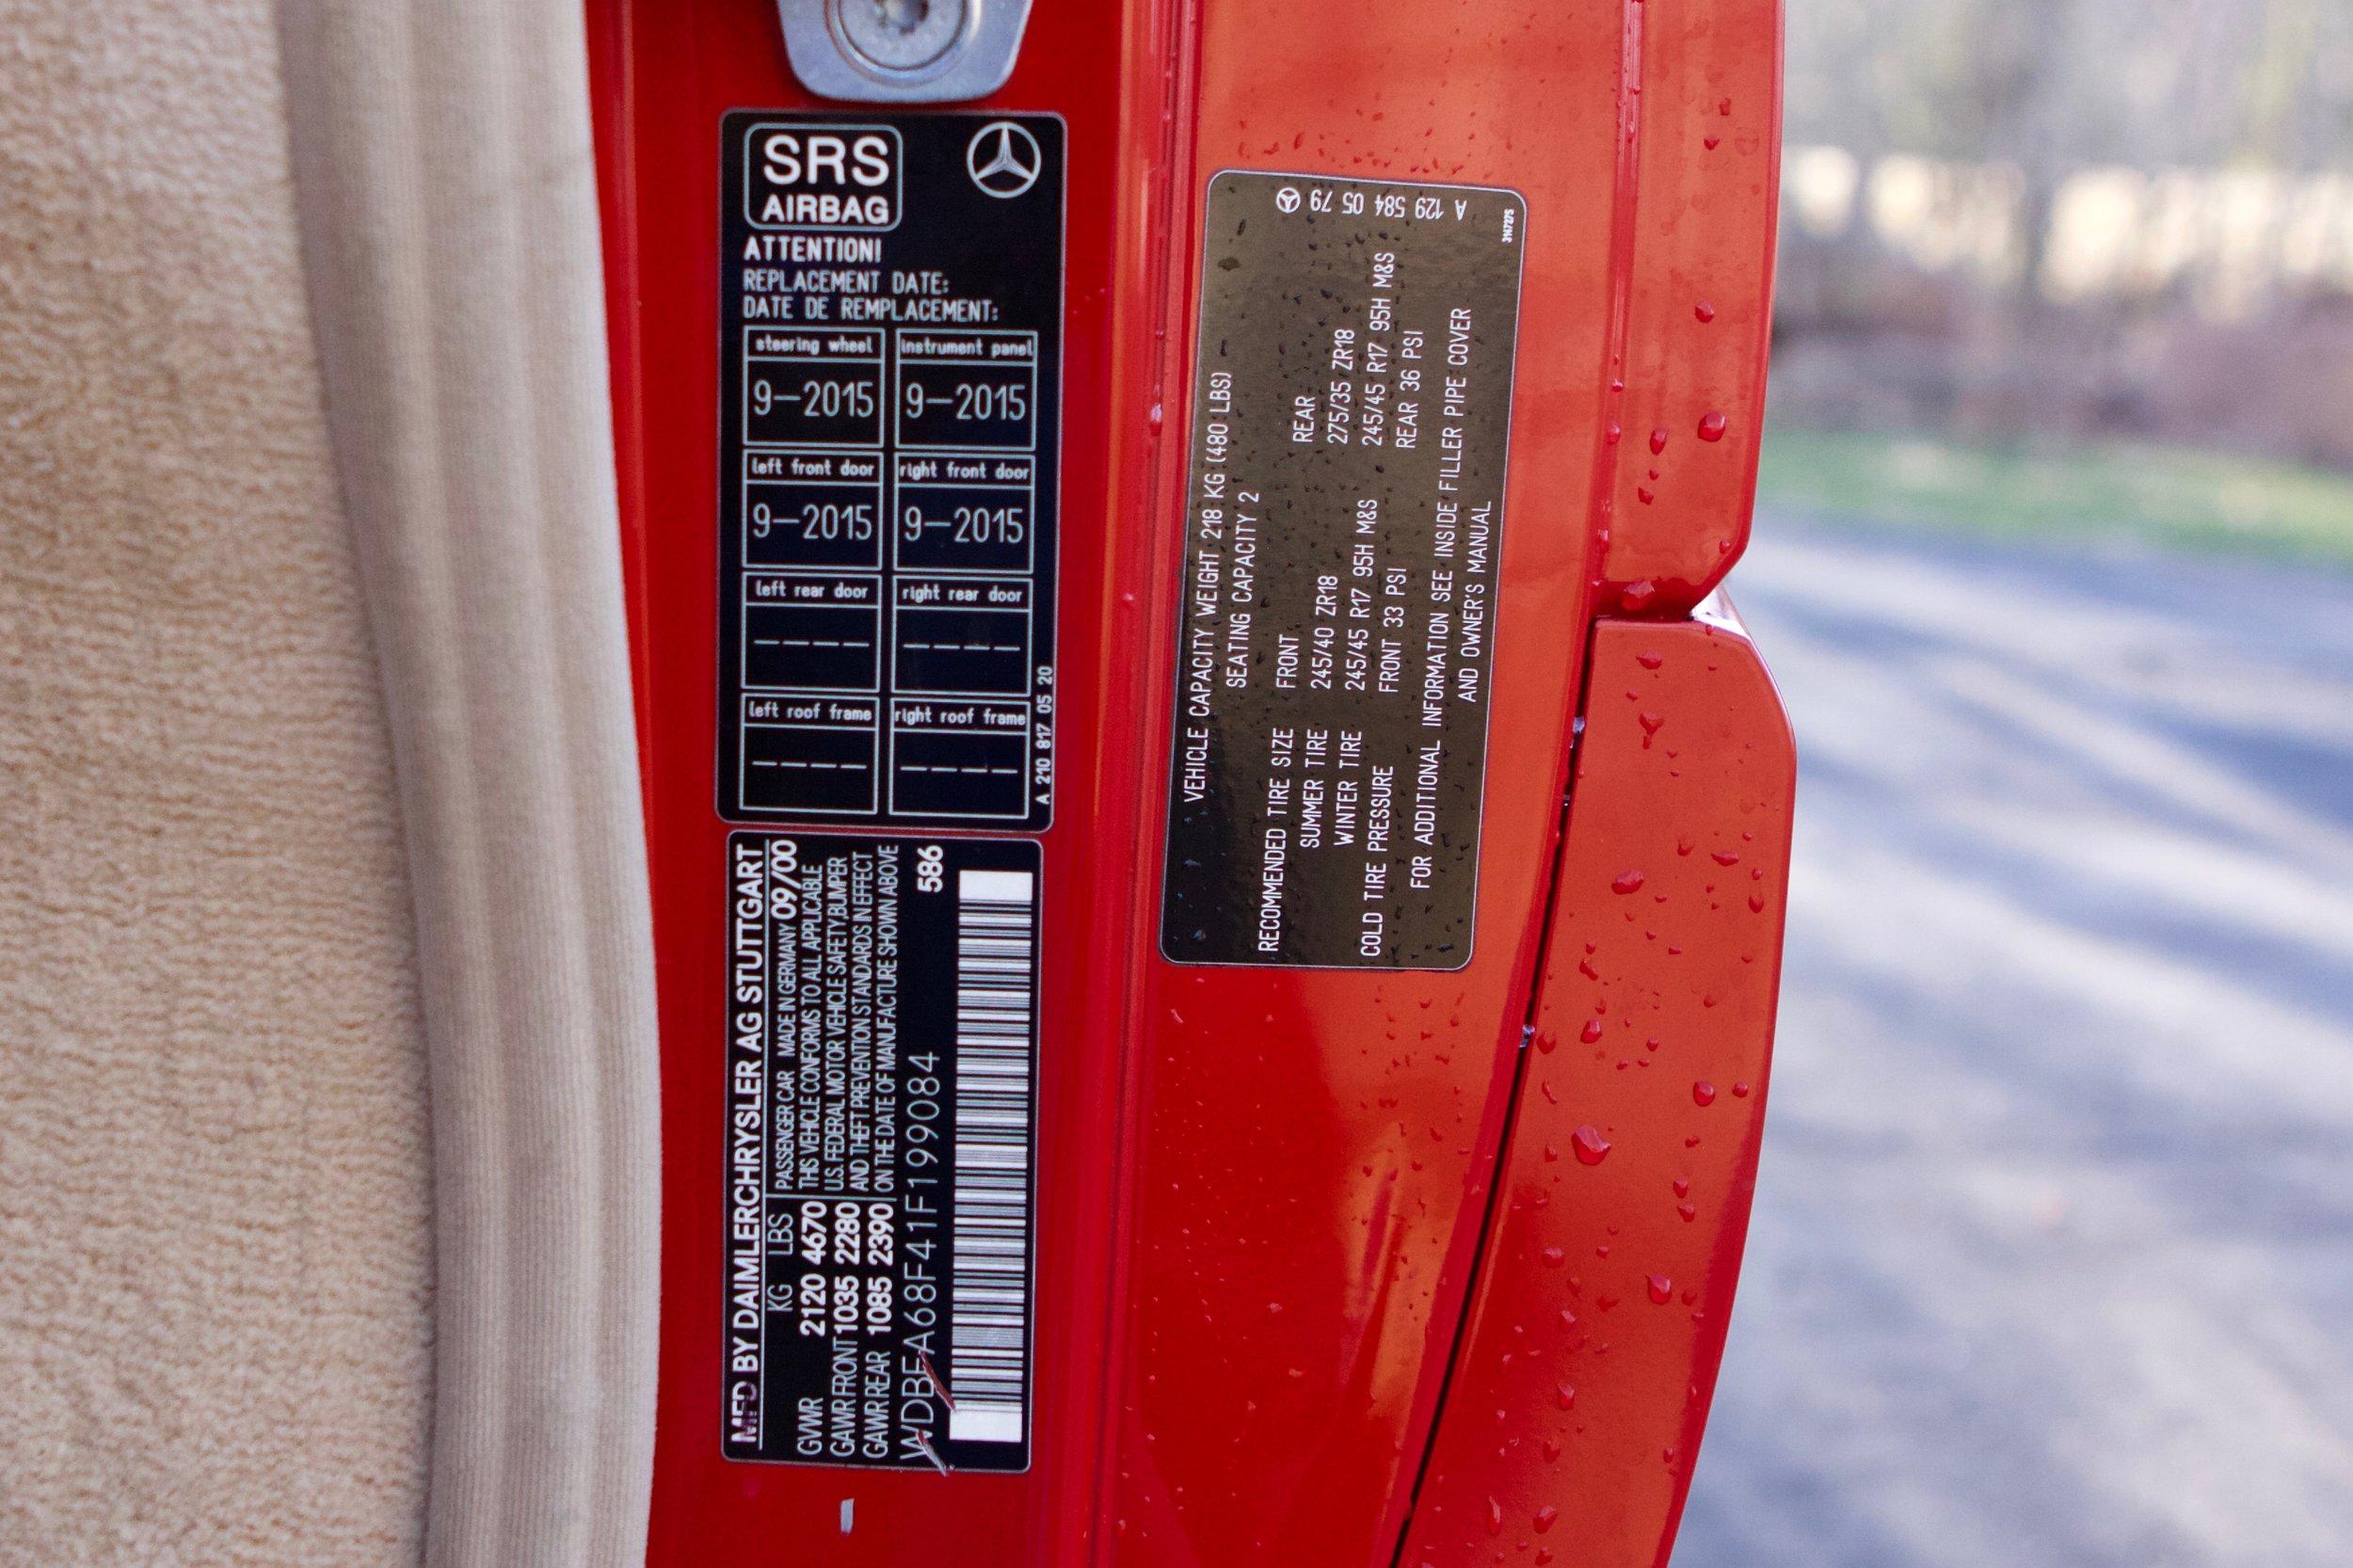 20190504 VIN199084 2001 500SL AMG - 17.jpg